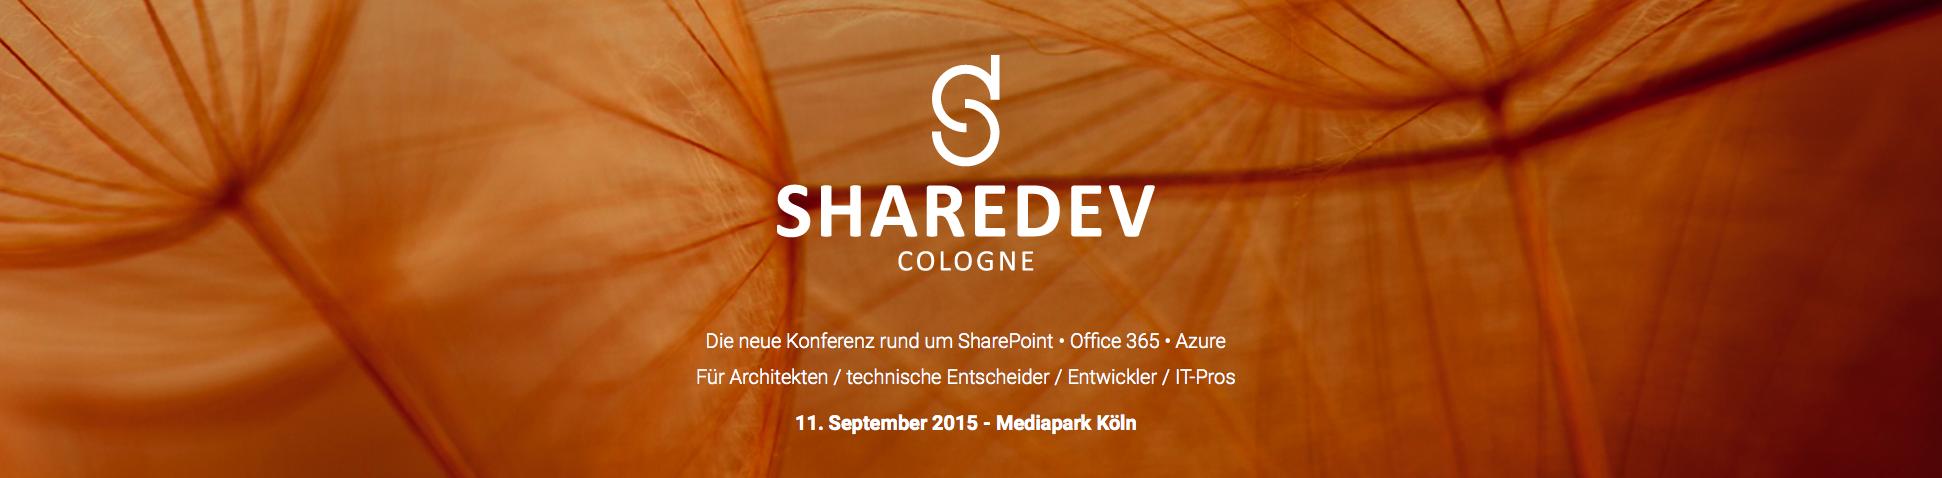 Sharedev_logo